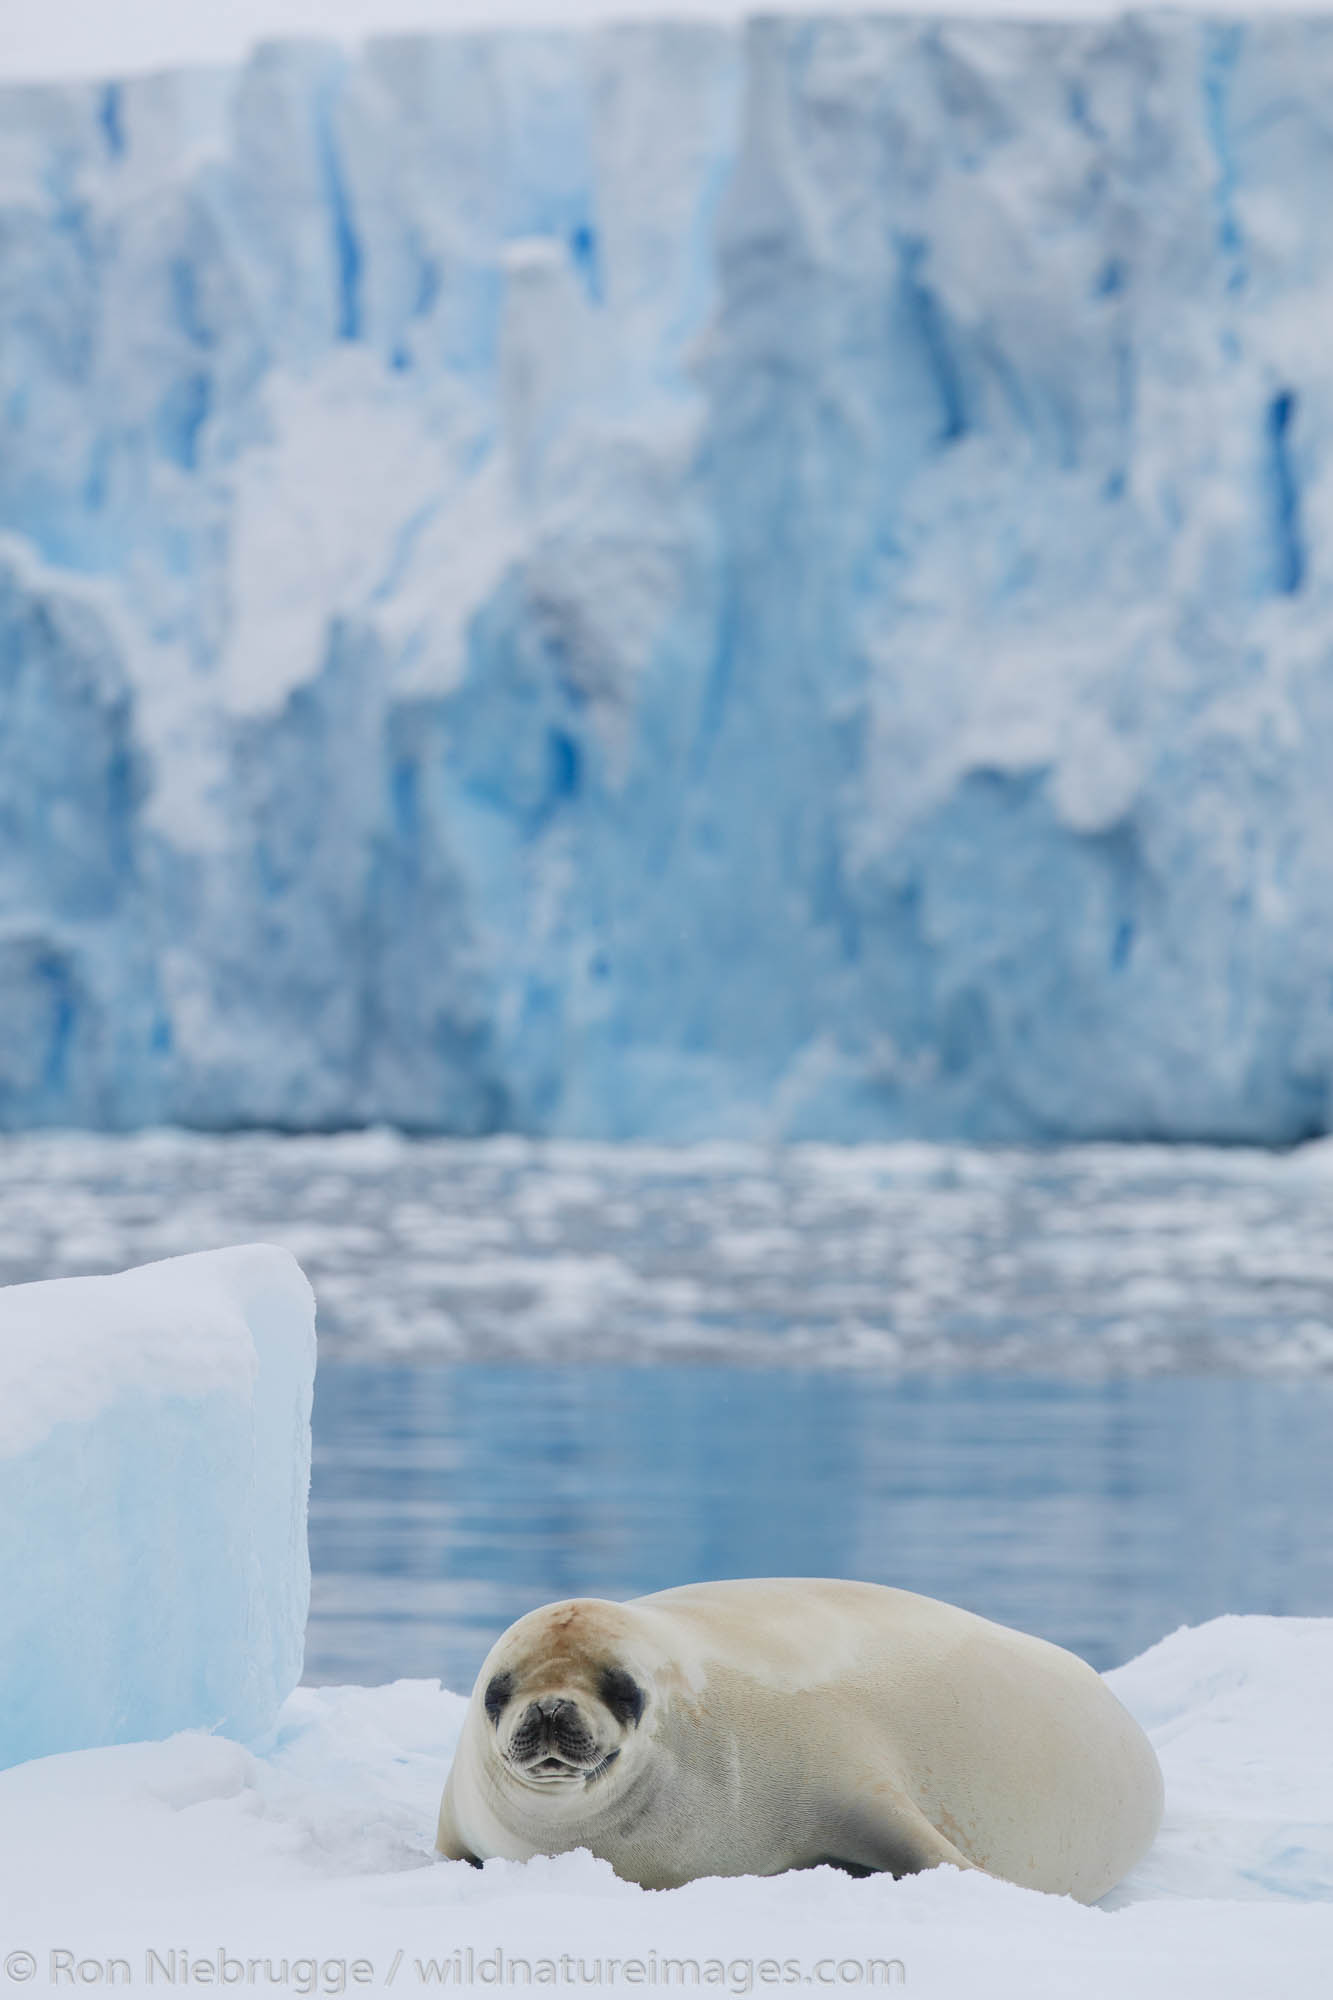 Crabeater seal (Lobodon carcinophaga or carcinophagus), Cierva Cove, Antarctica.